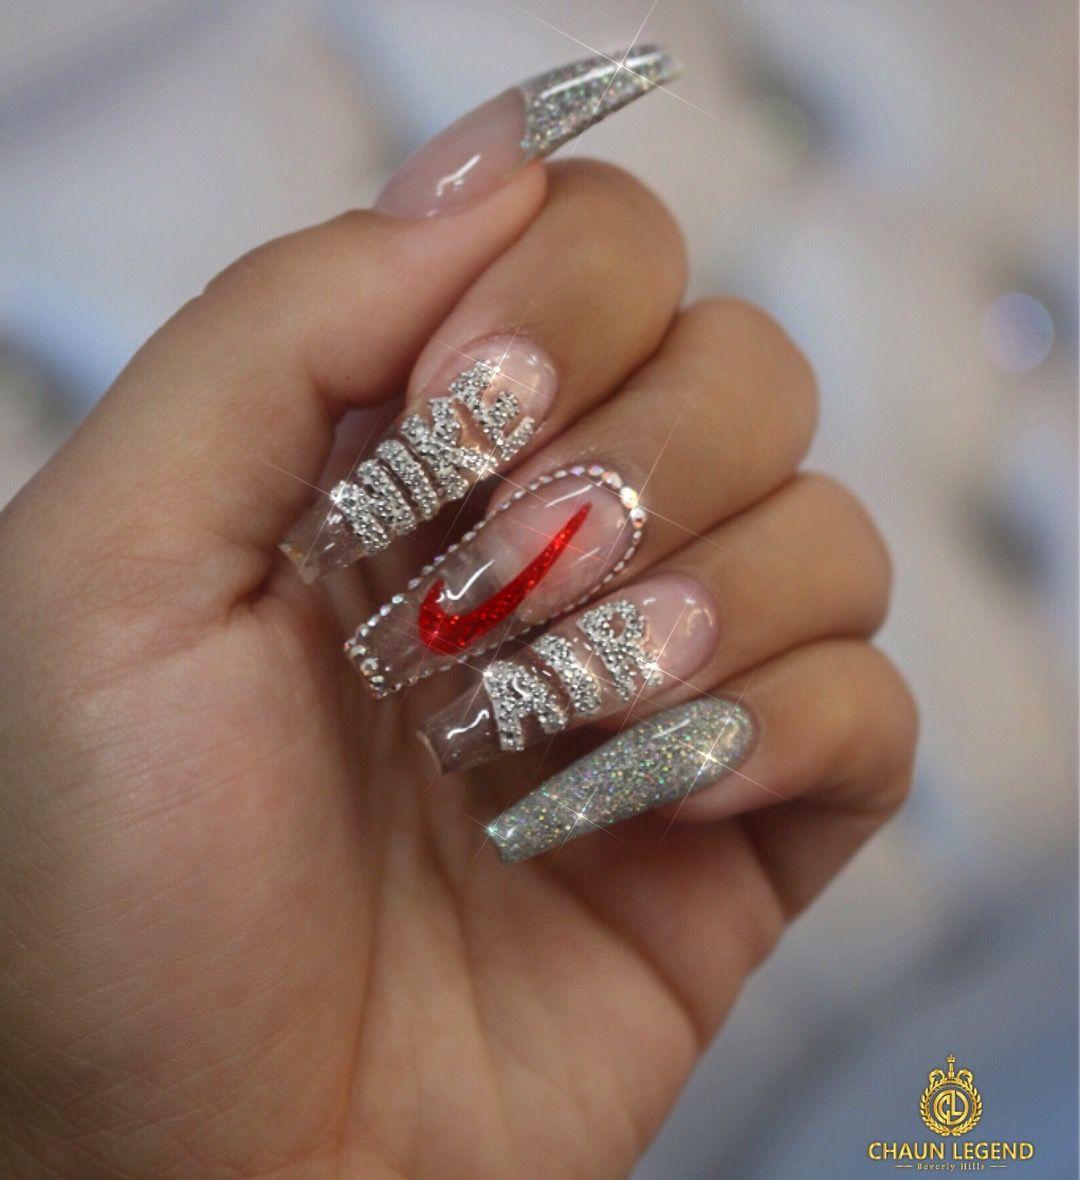 Pinterest Lolaxxlola Nike Nails Glass Nails Swag Nails